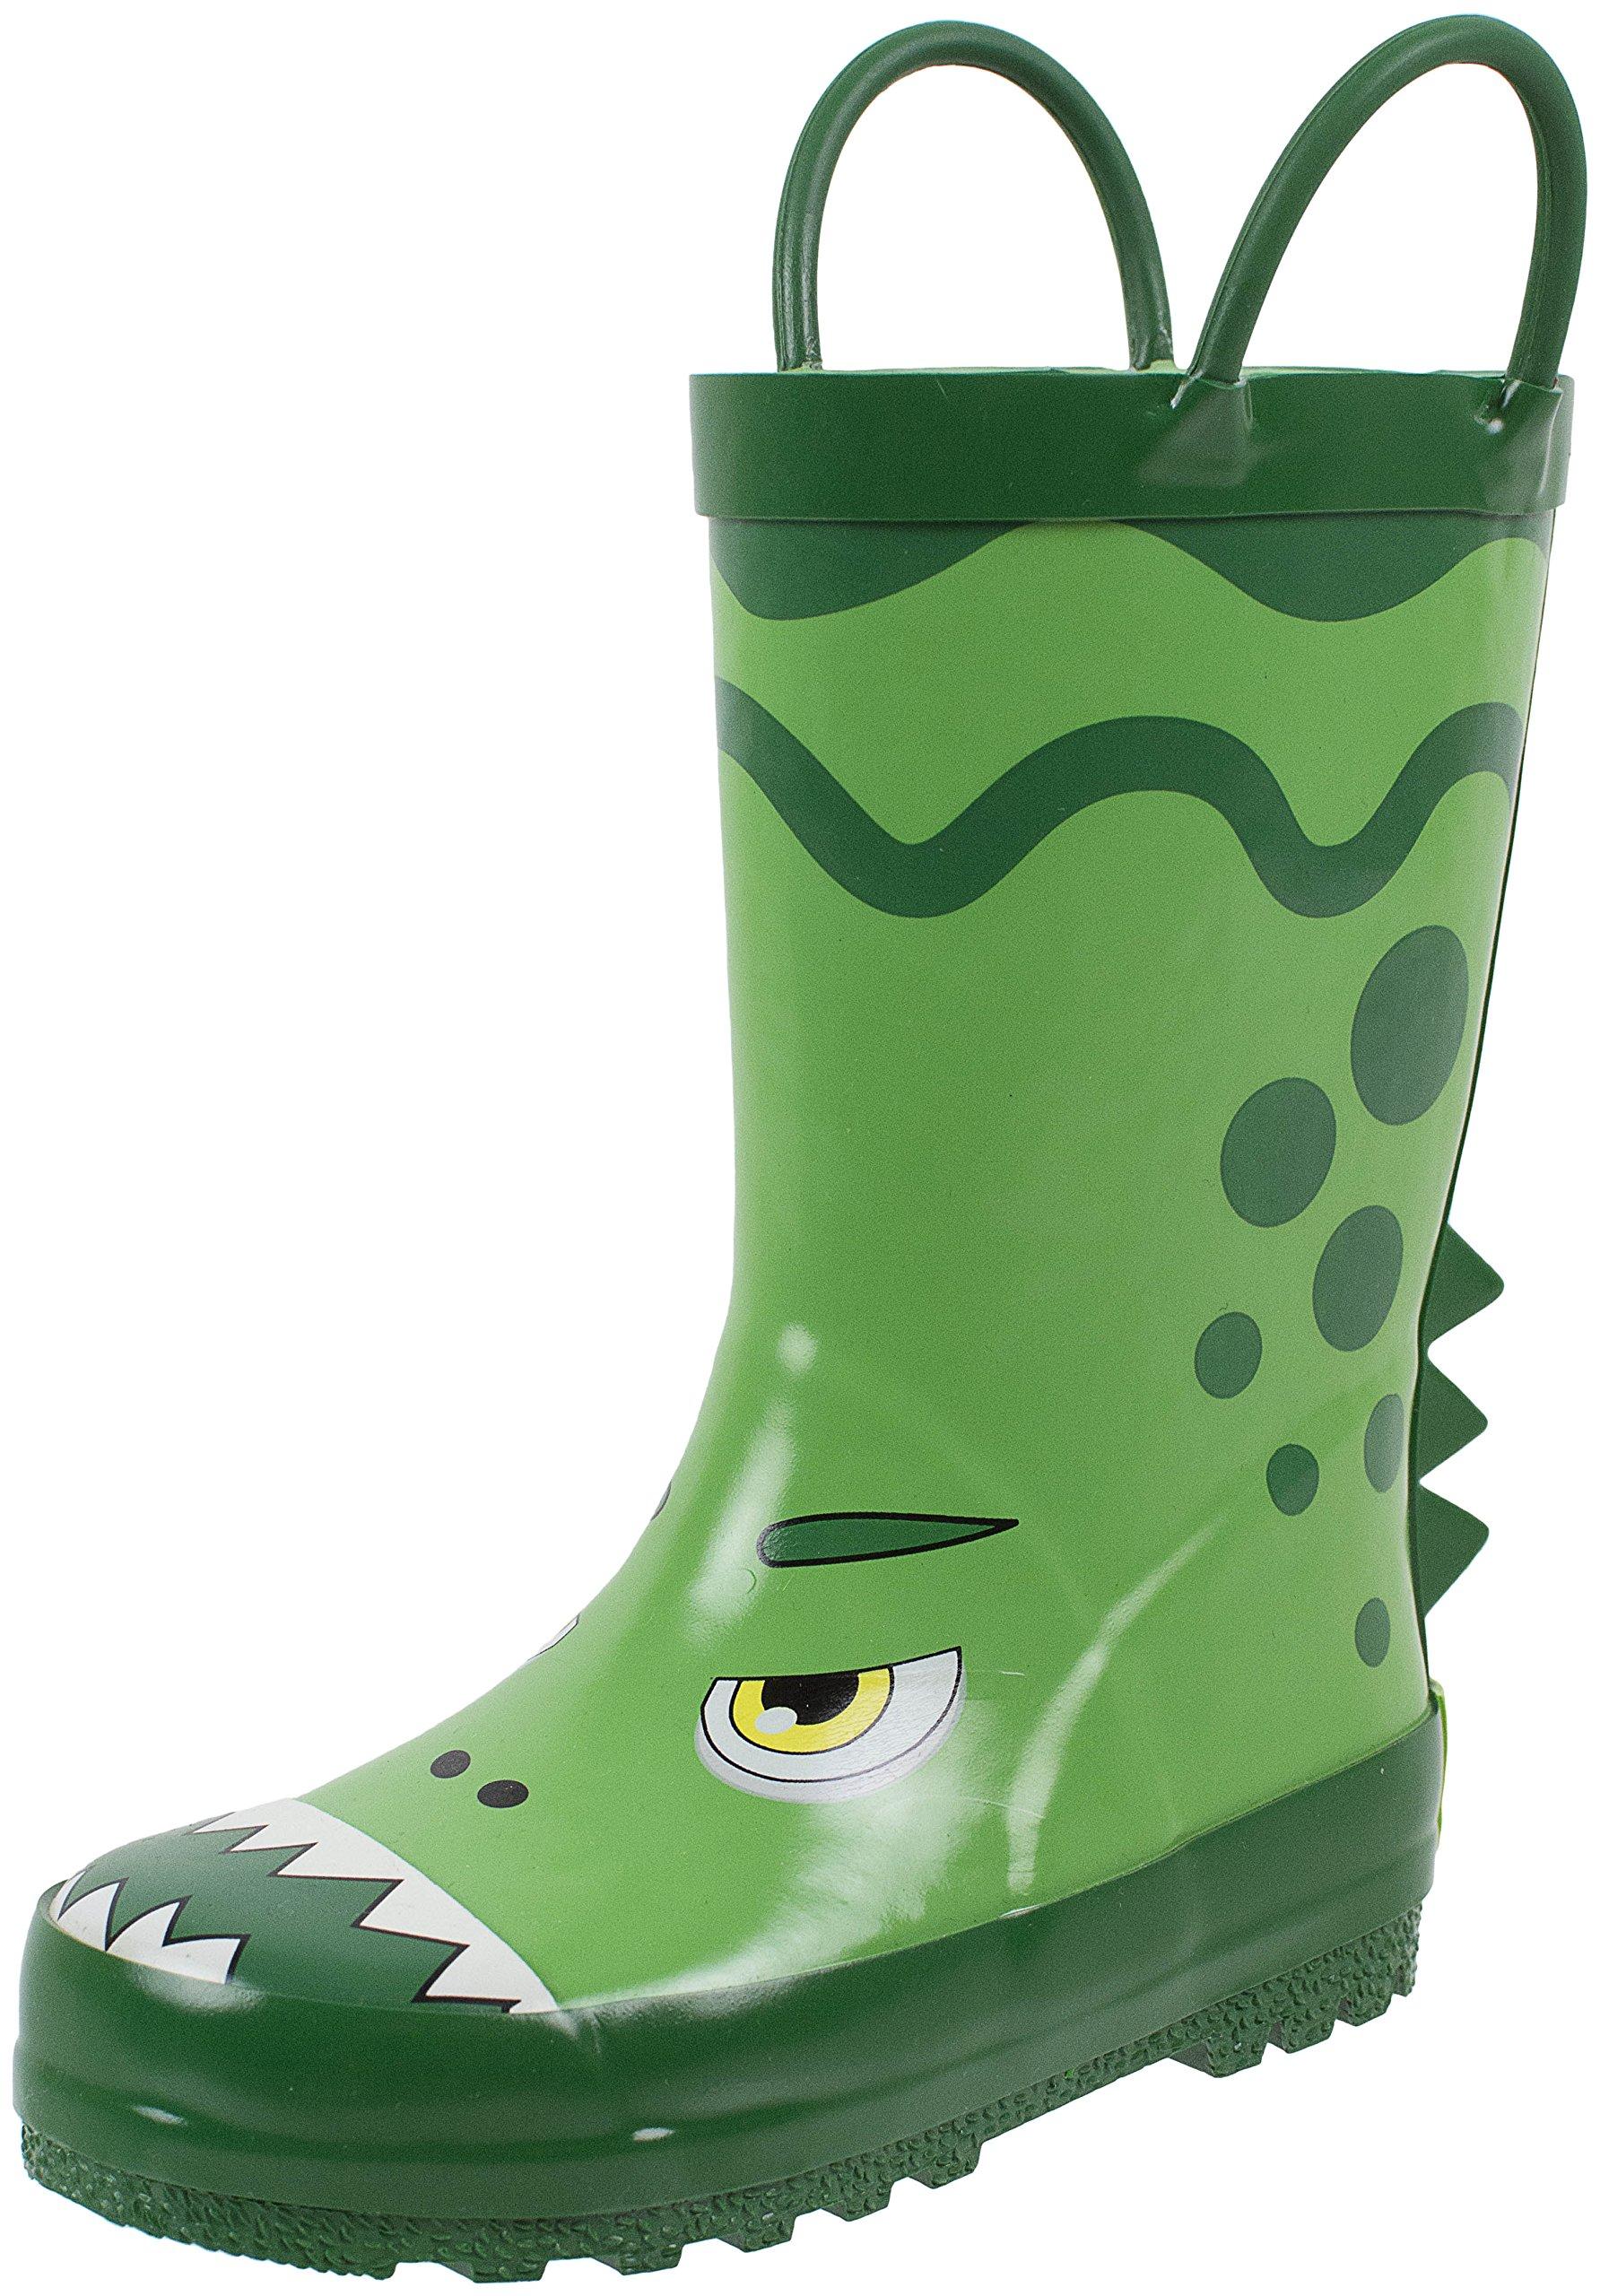 Rainbow Daze Dino Dragon Green Dragon Dinosaur Printed Rubber Rain Boots for Kids Size 9/10